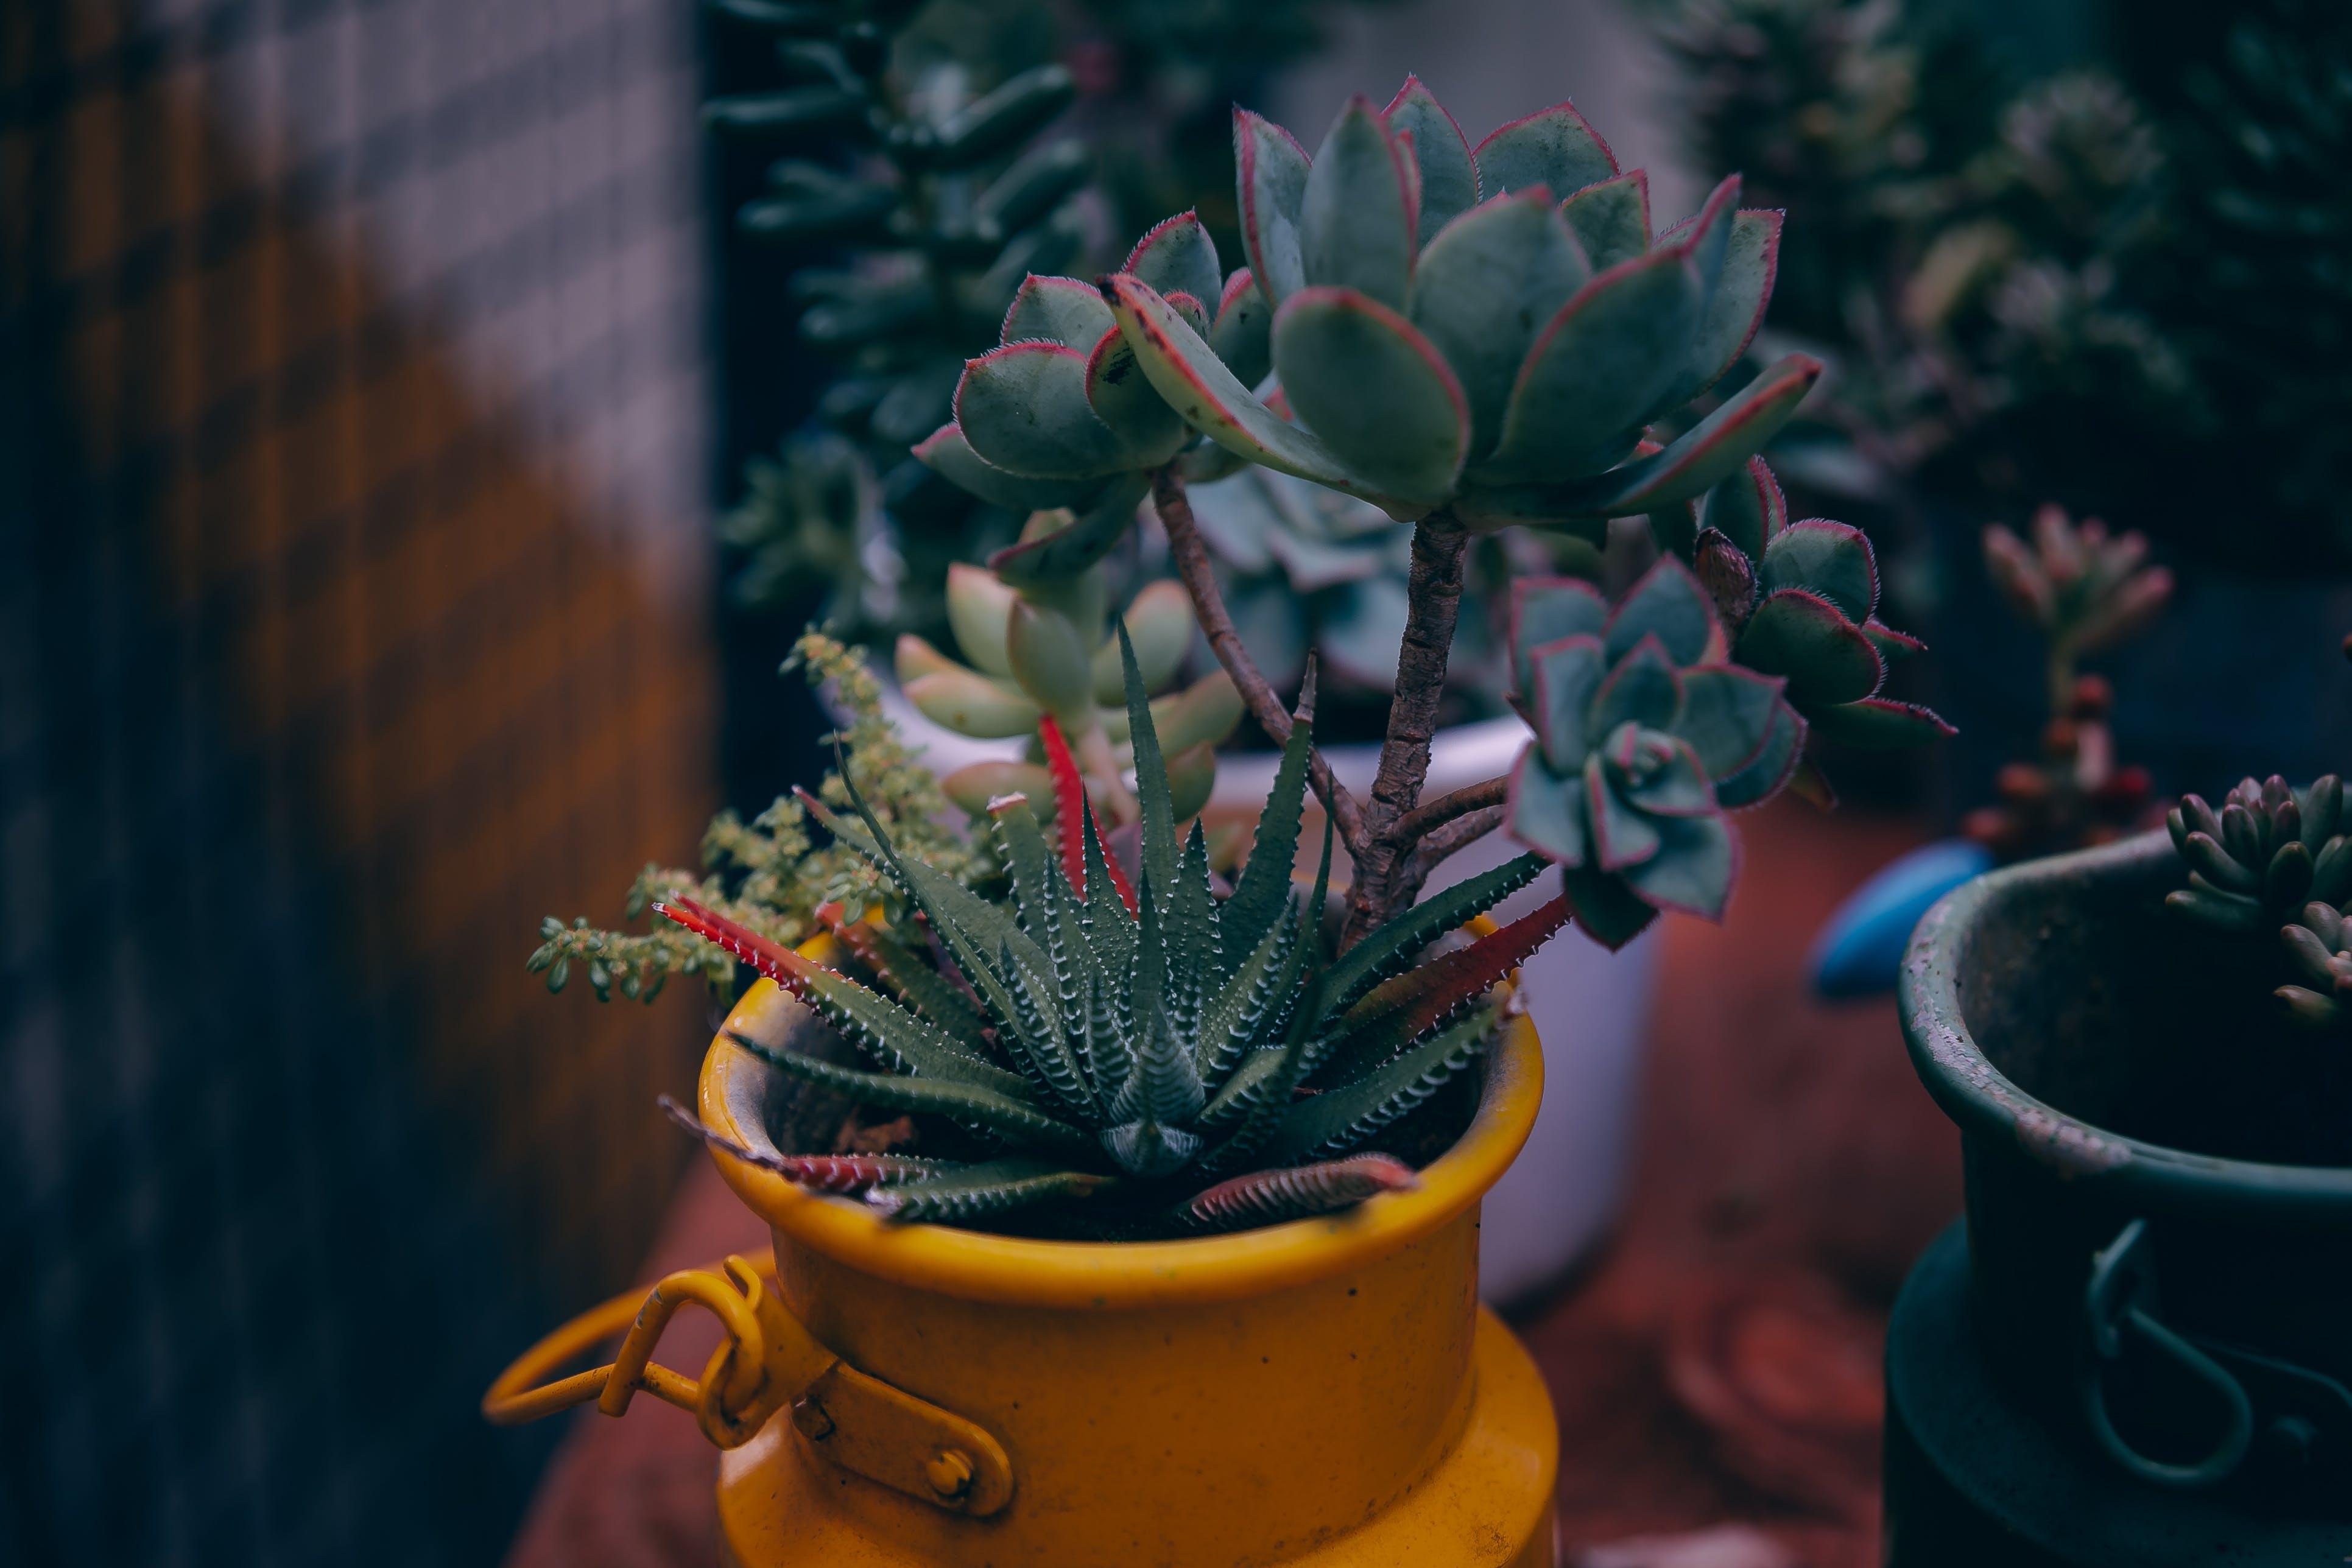 Green Succulent Plant Selective Focus Photography